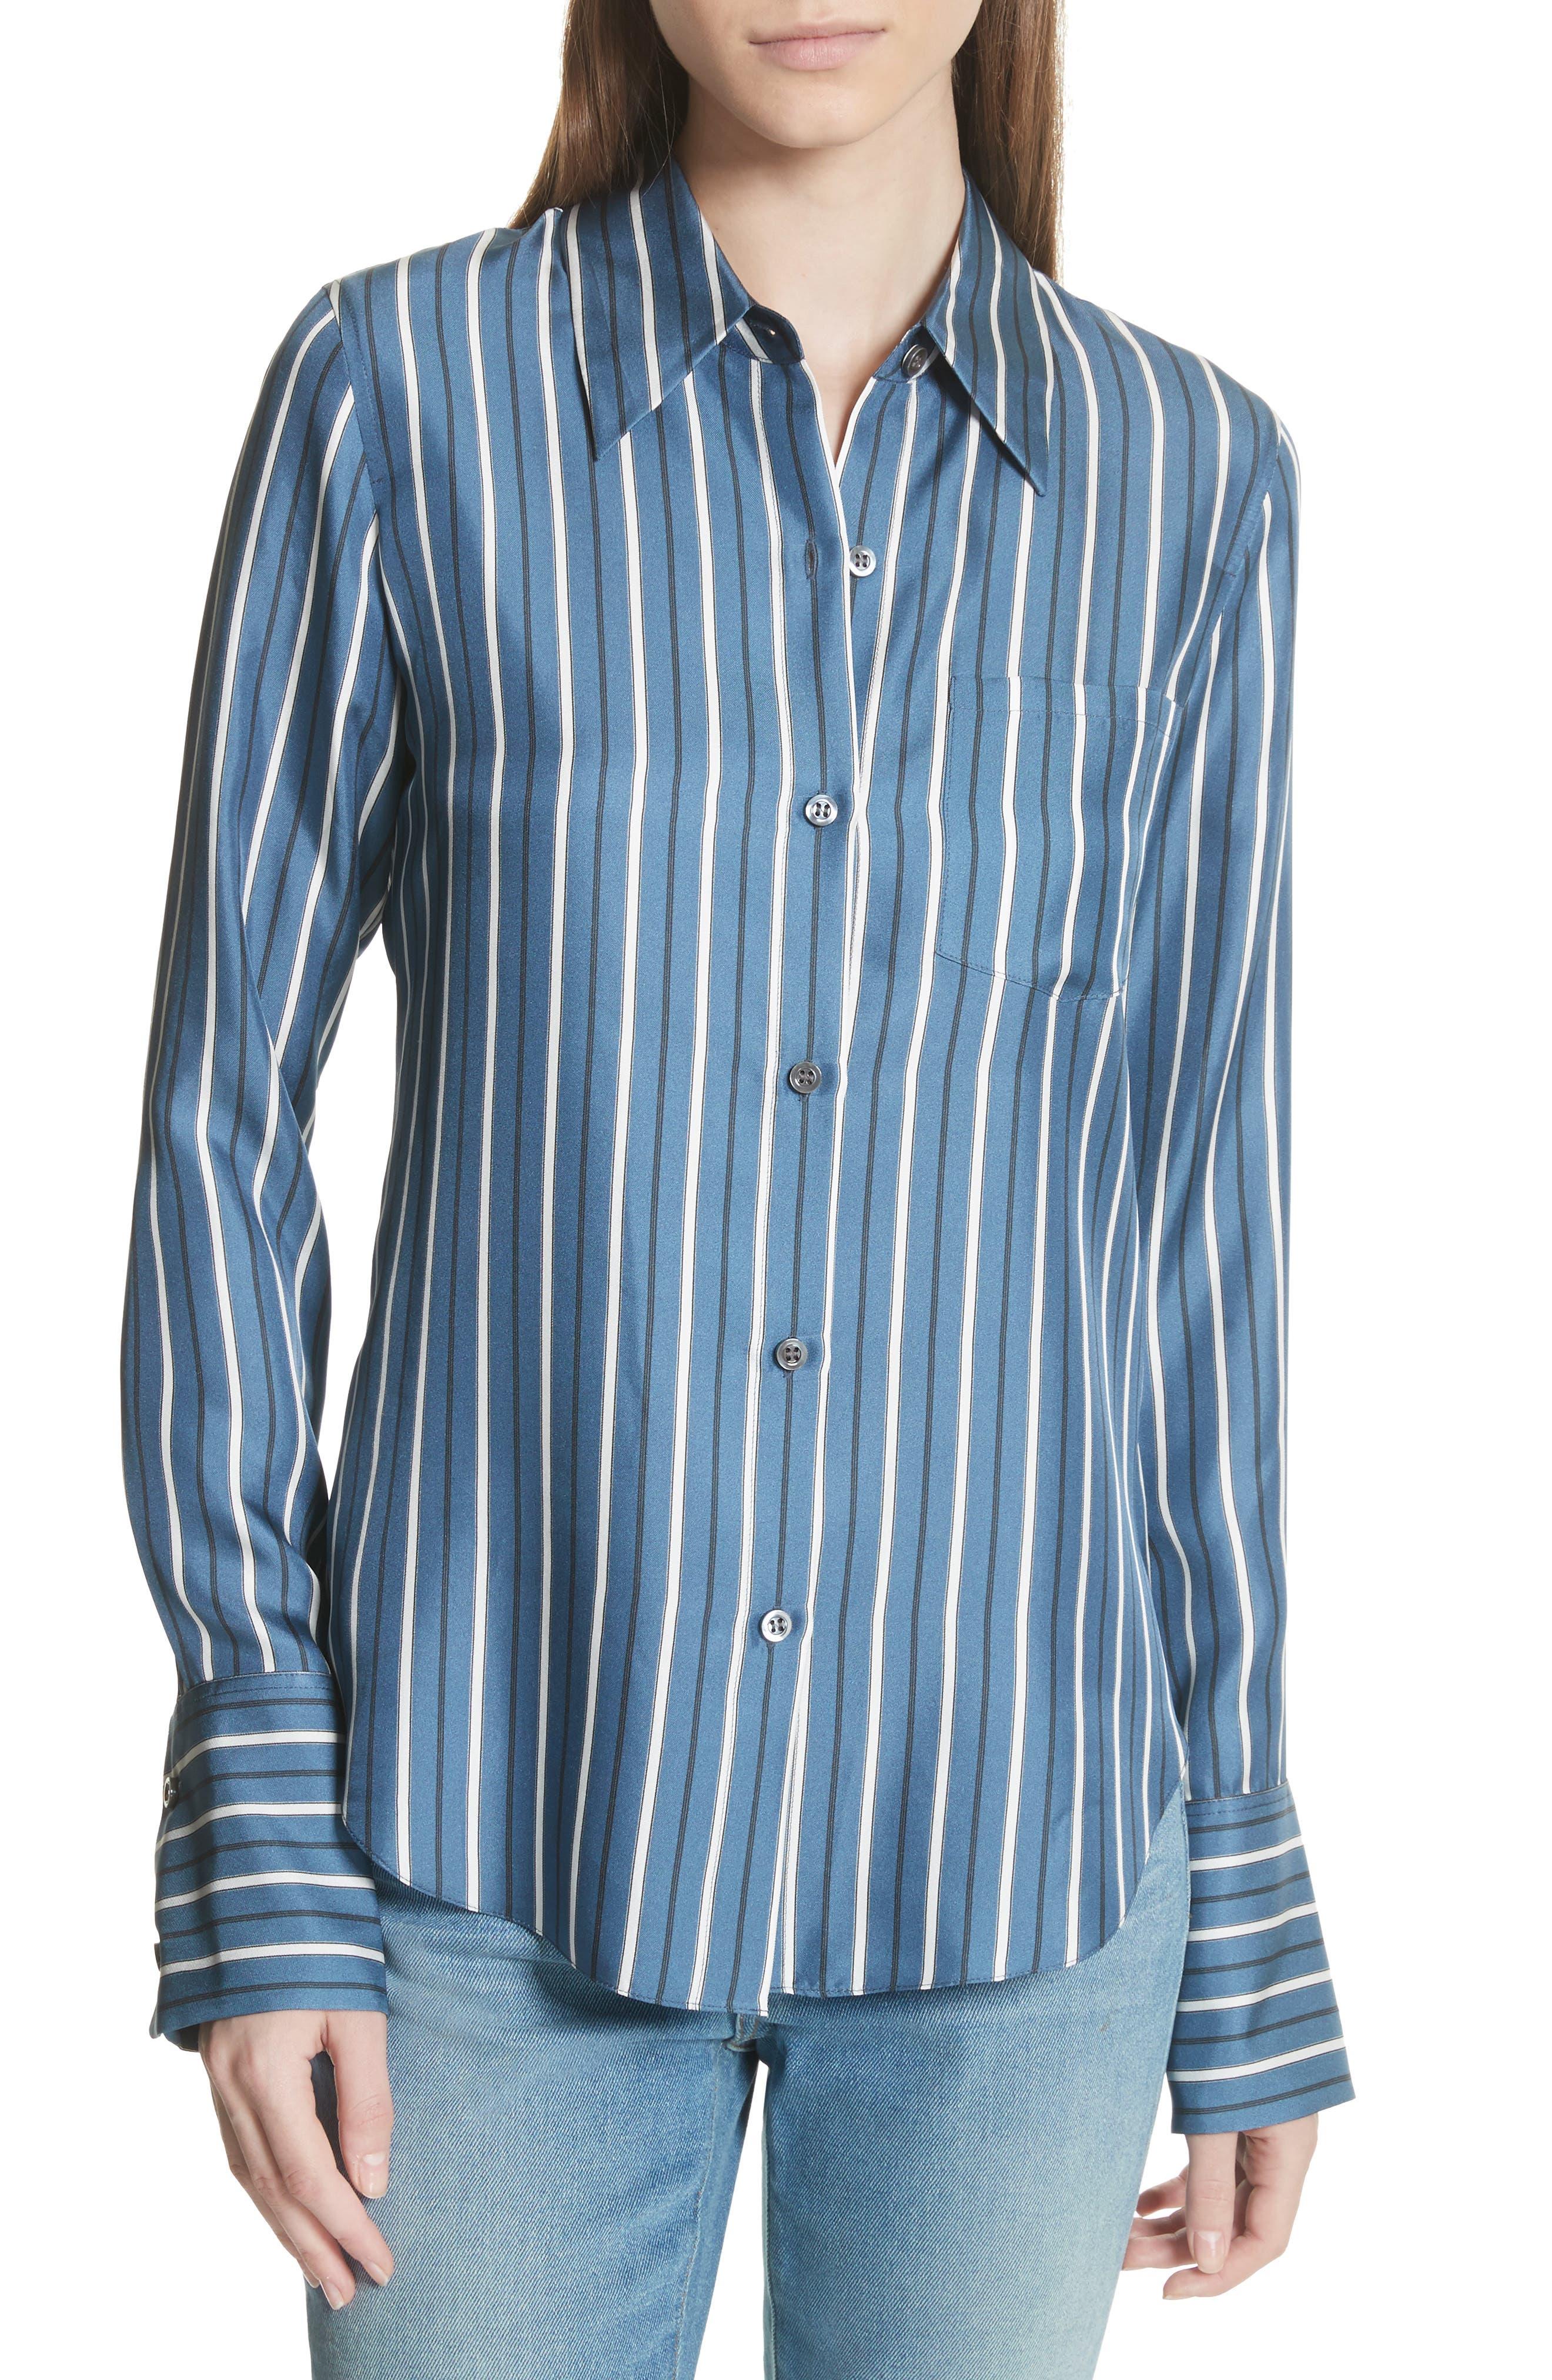 Darby Silk Button Shirt,                             Main thumbnail 1, color,                             491